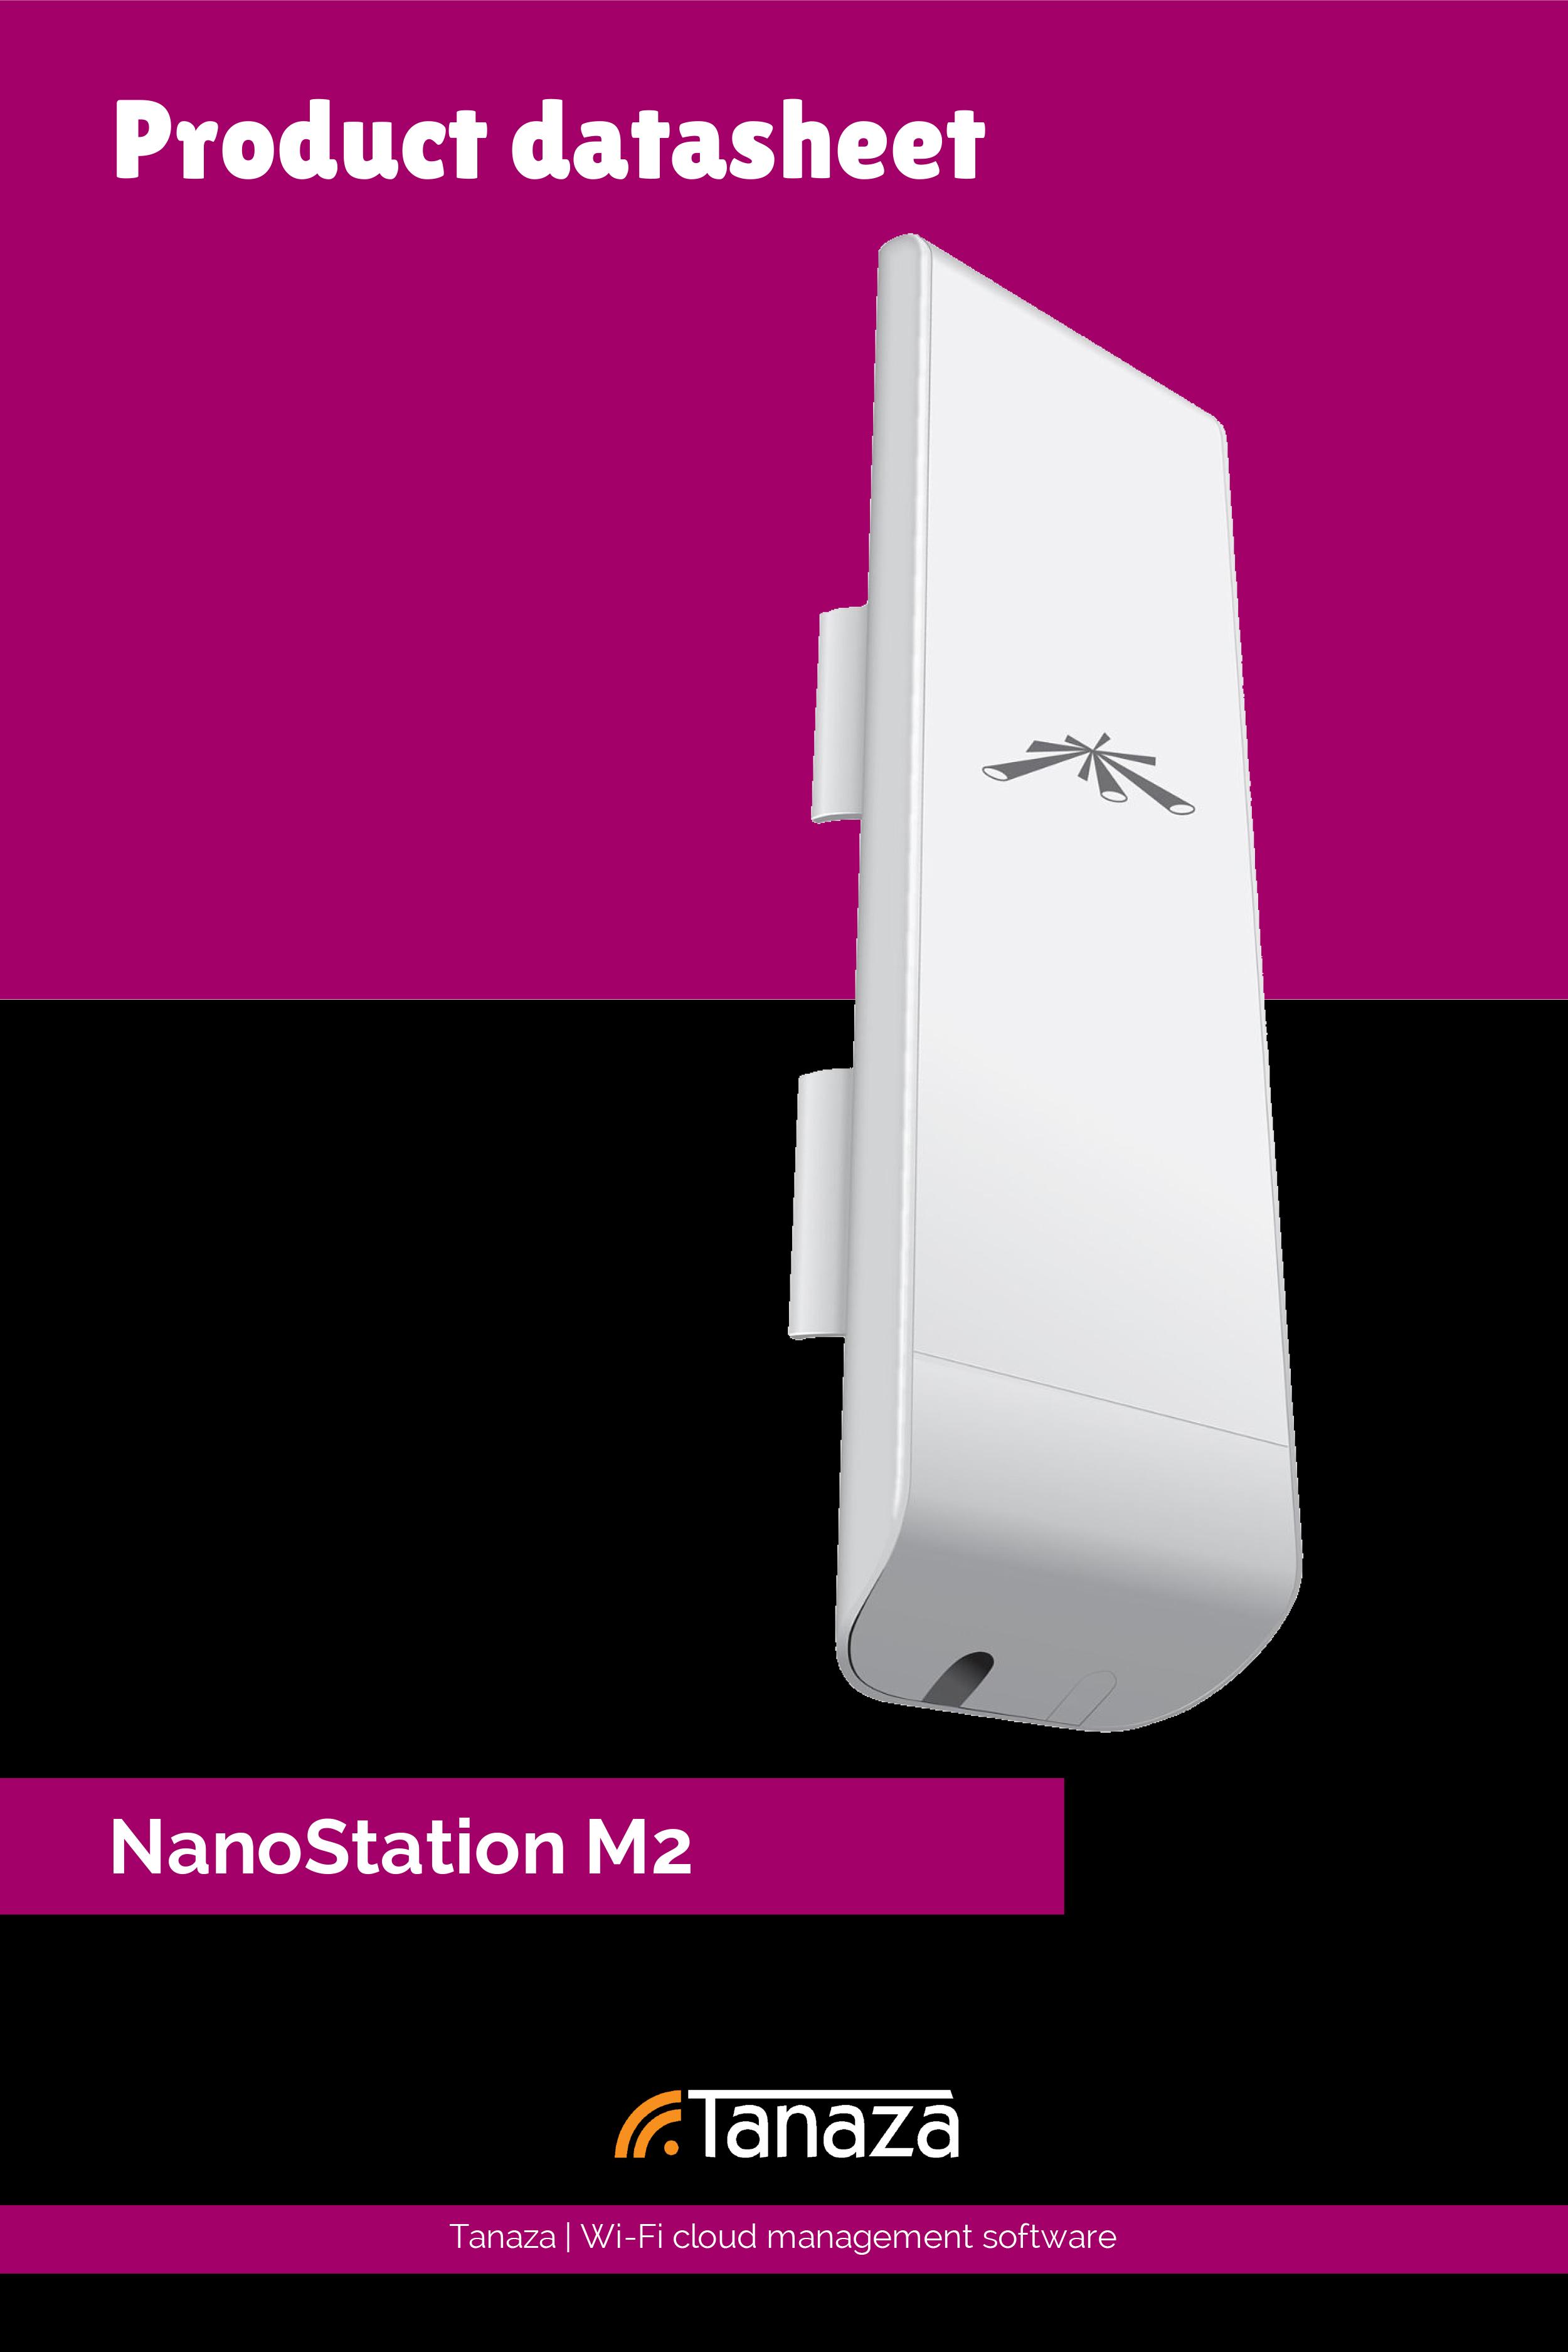 Nanostation NSM2 - Nano Station by Ubiquiti Networks - Nanostation Datasheet - Tanaza firmware